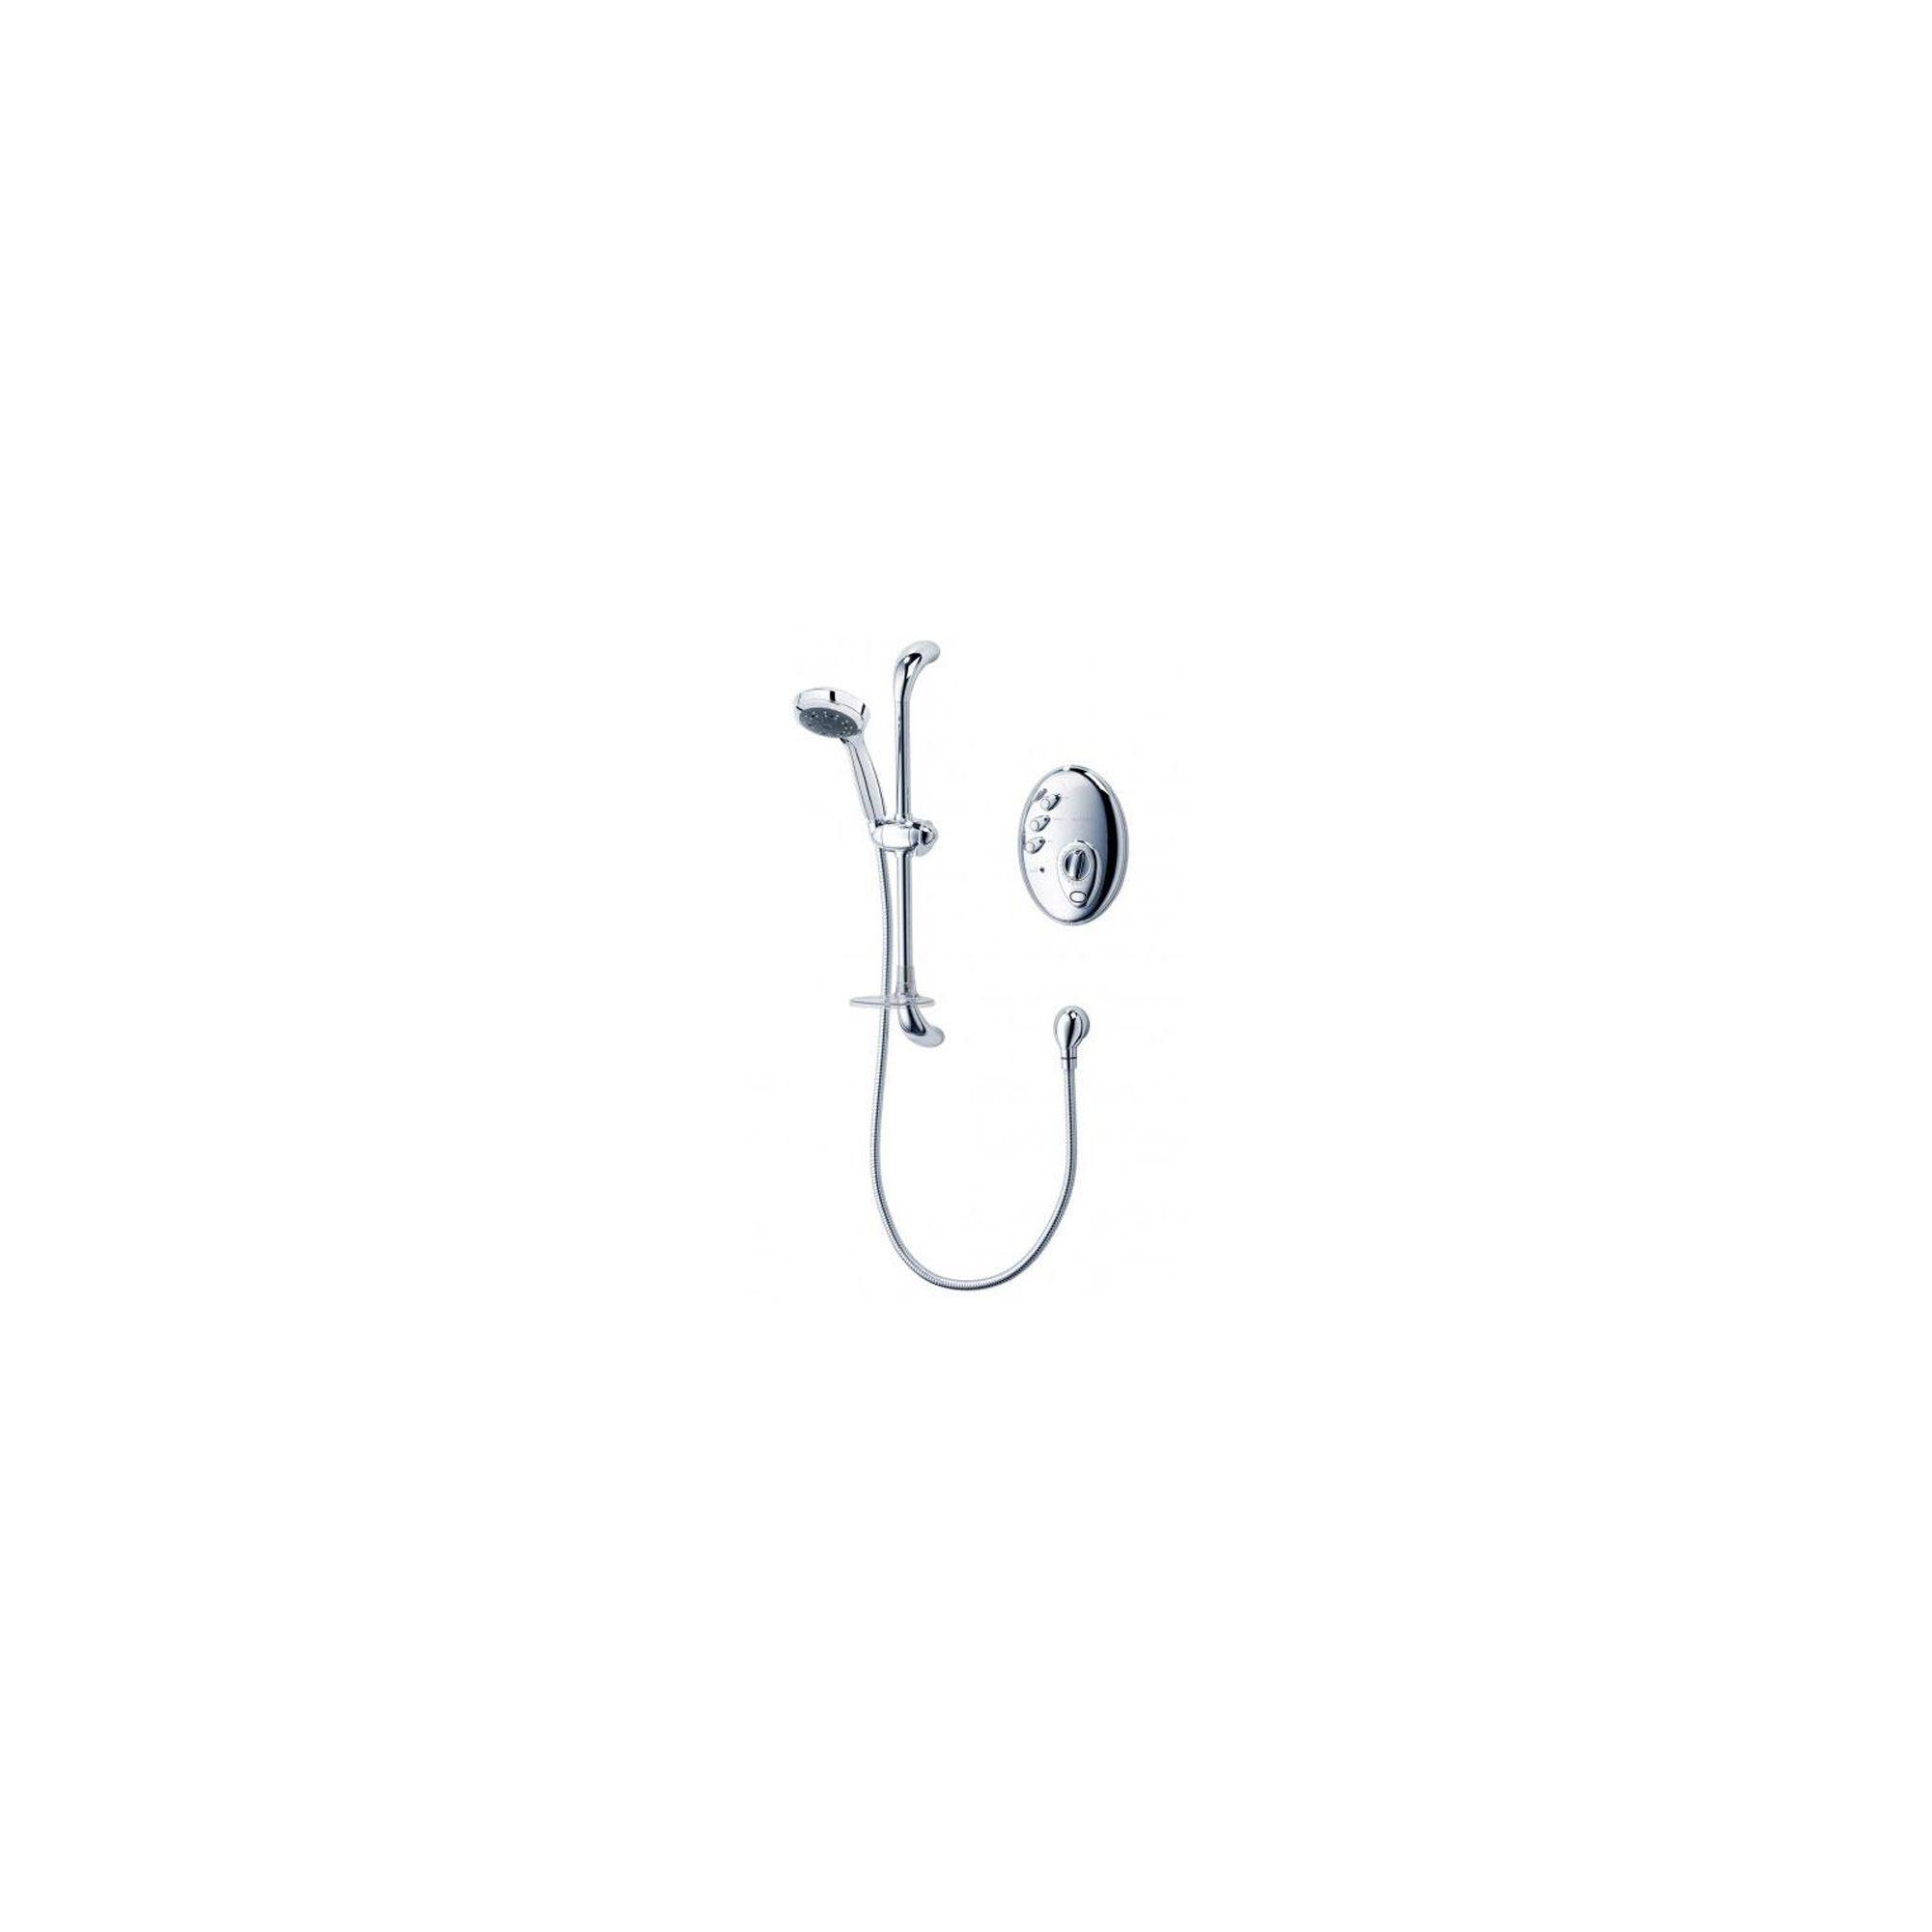 Triton Aspirante Digital Remote Electric Shower Chrome 10.5 kW at Tesco Direct